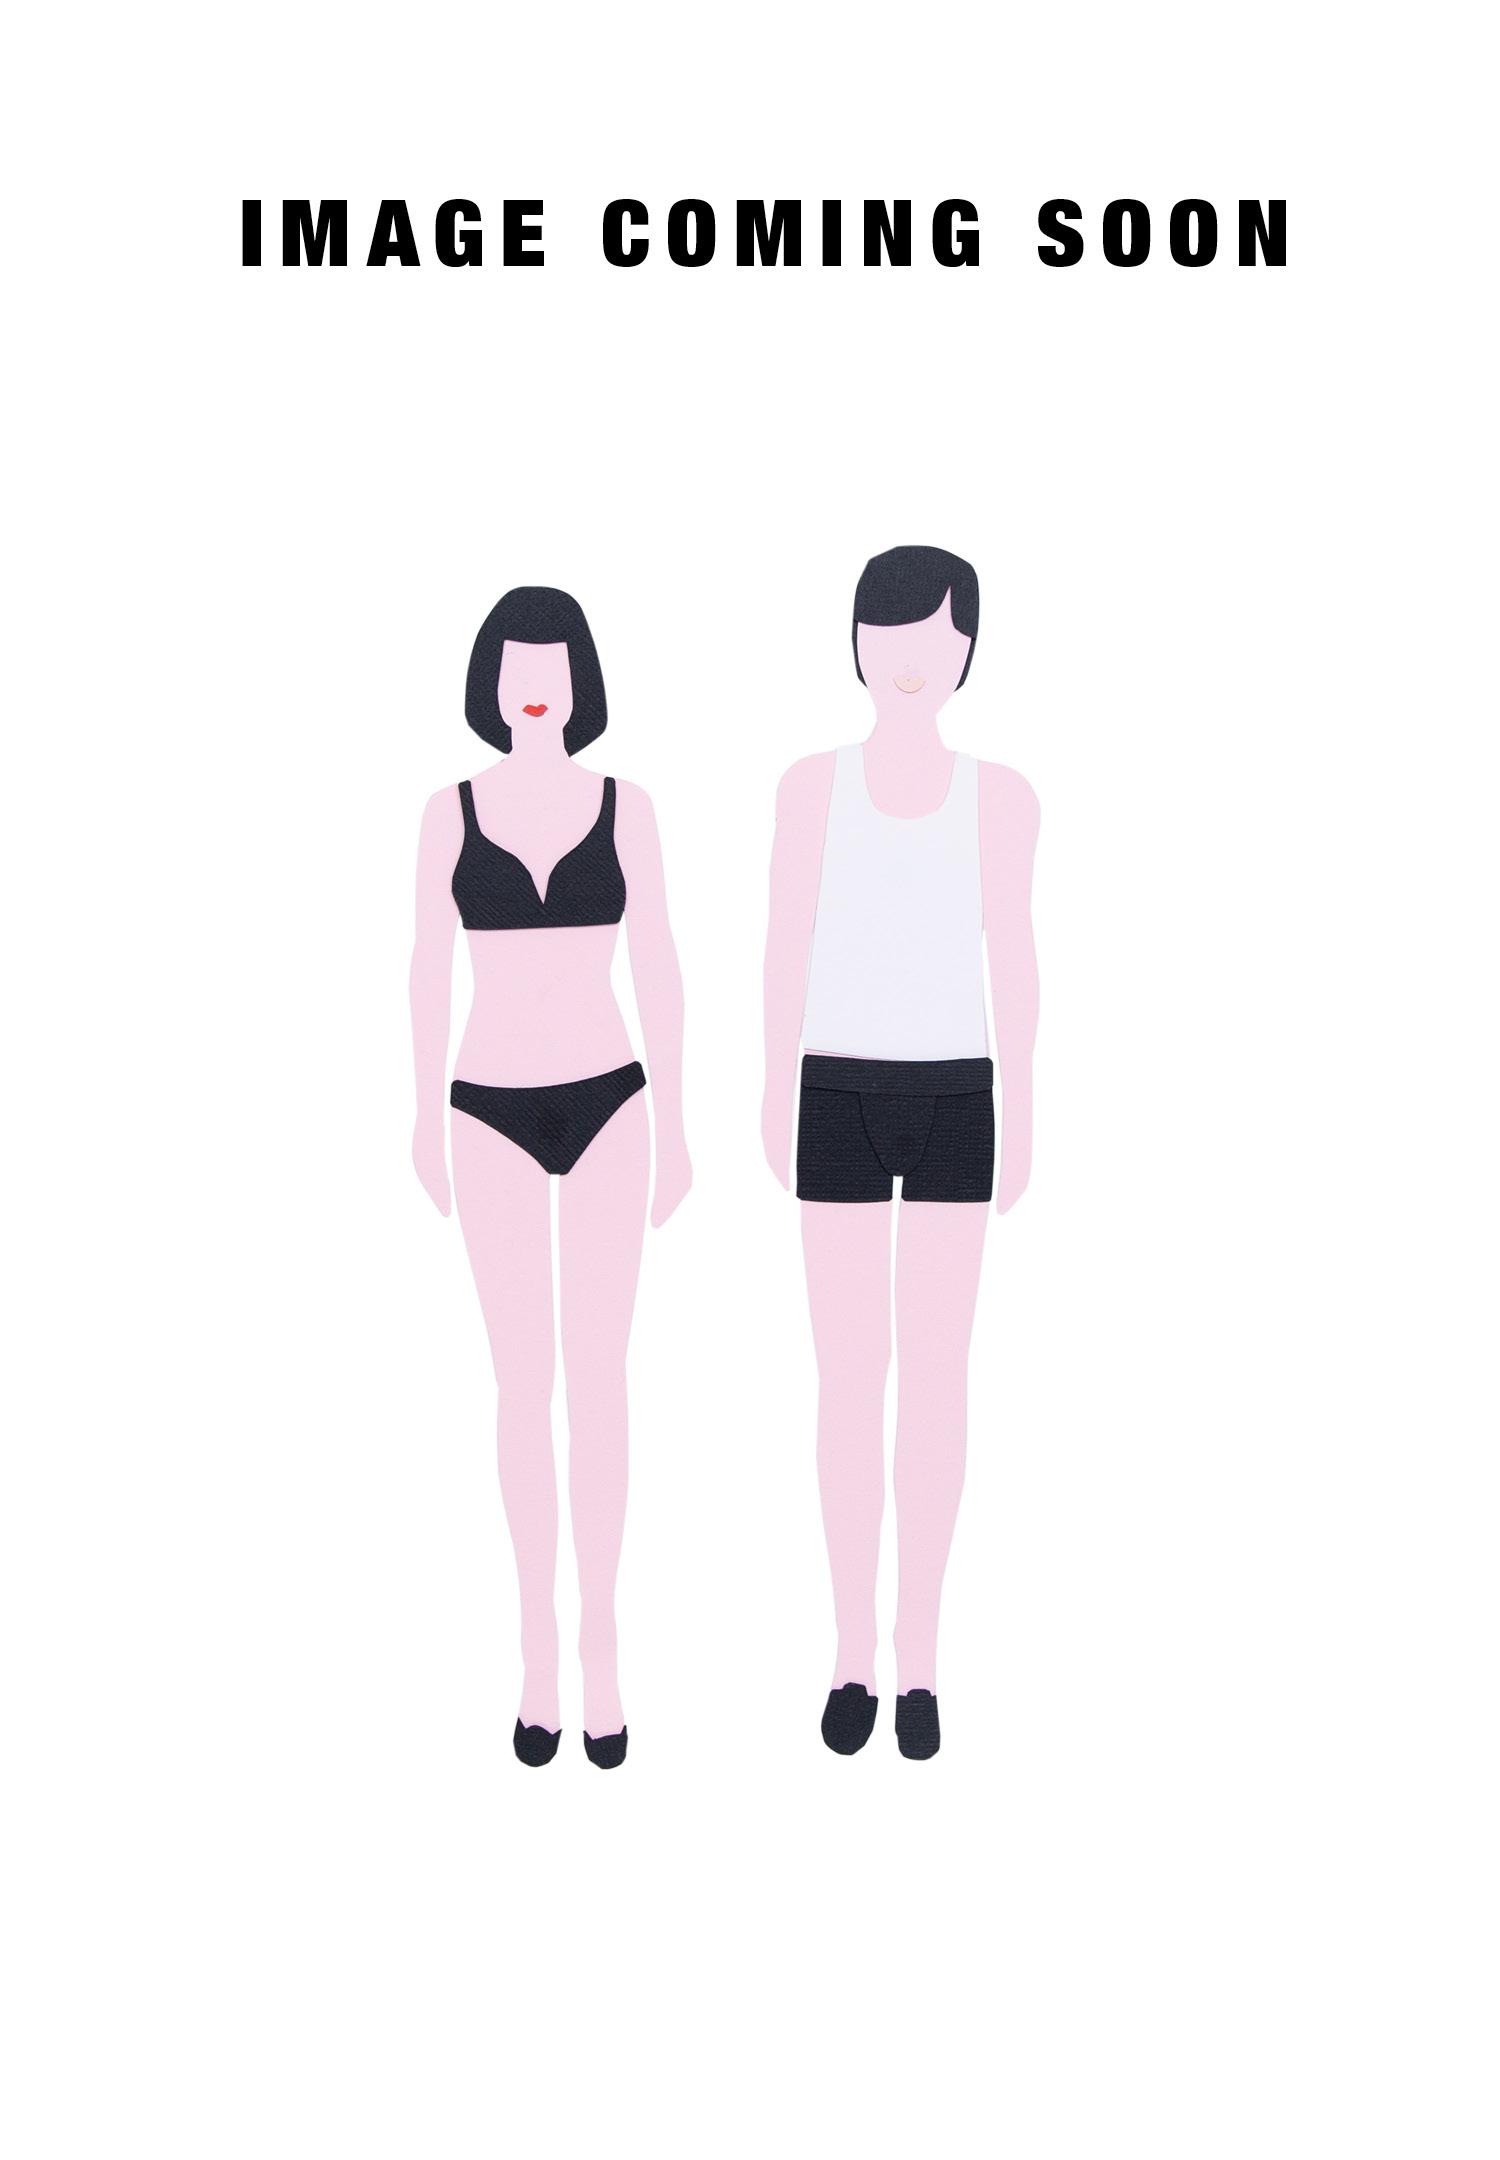 SKINY_212_W_EveryDayInCottonEssentials_bikinibriefs3pack_081482_08S111_040.jpg